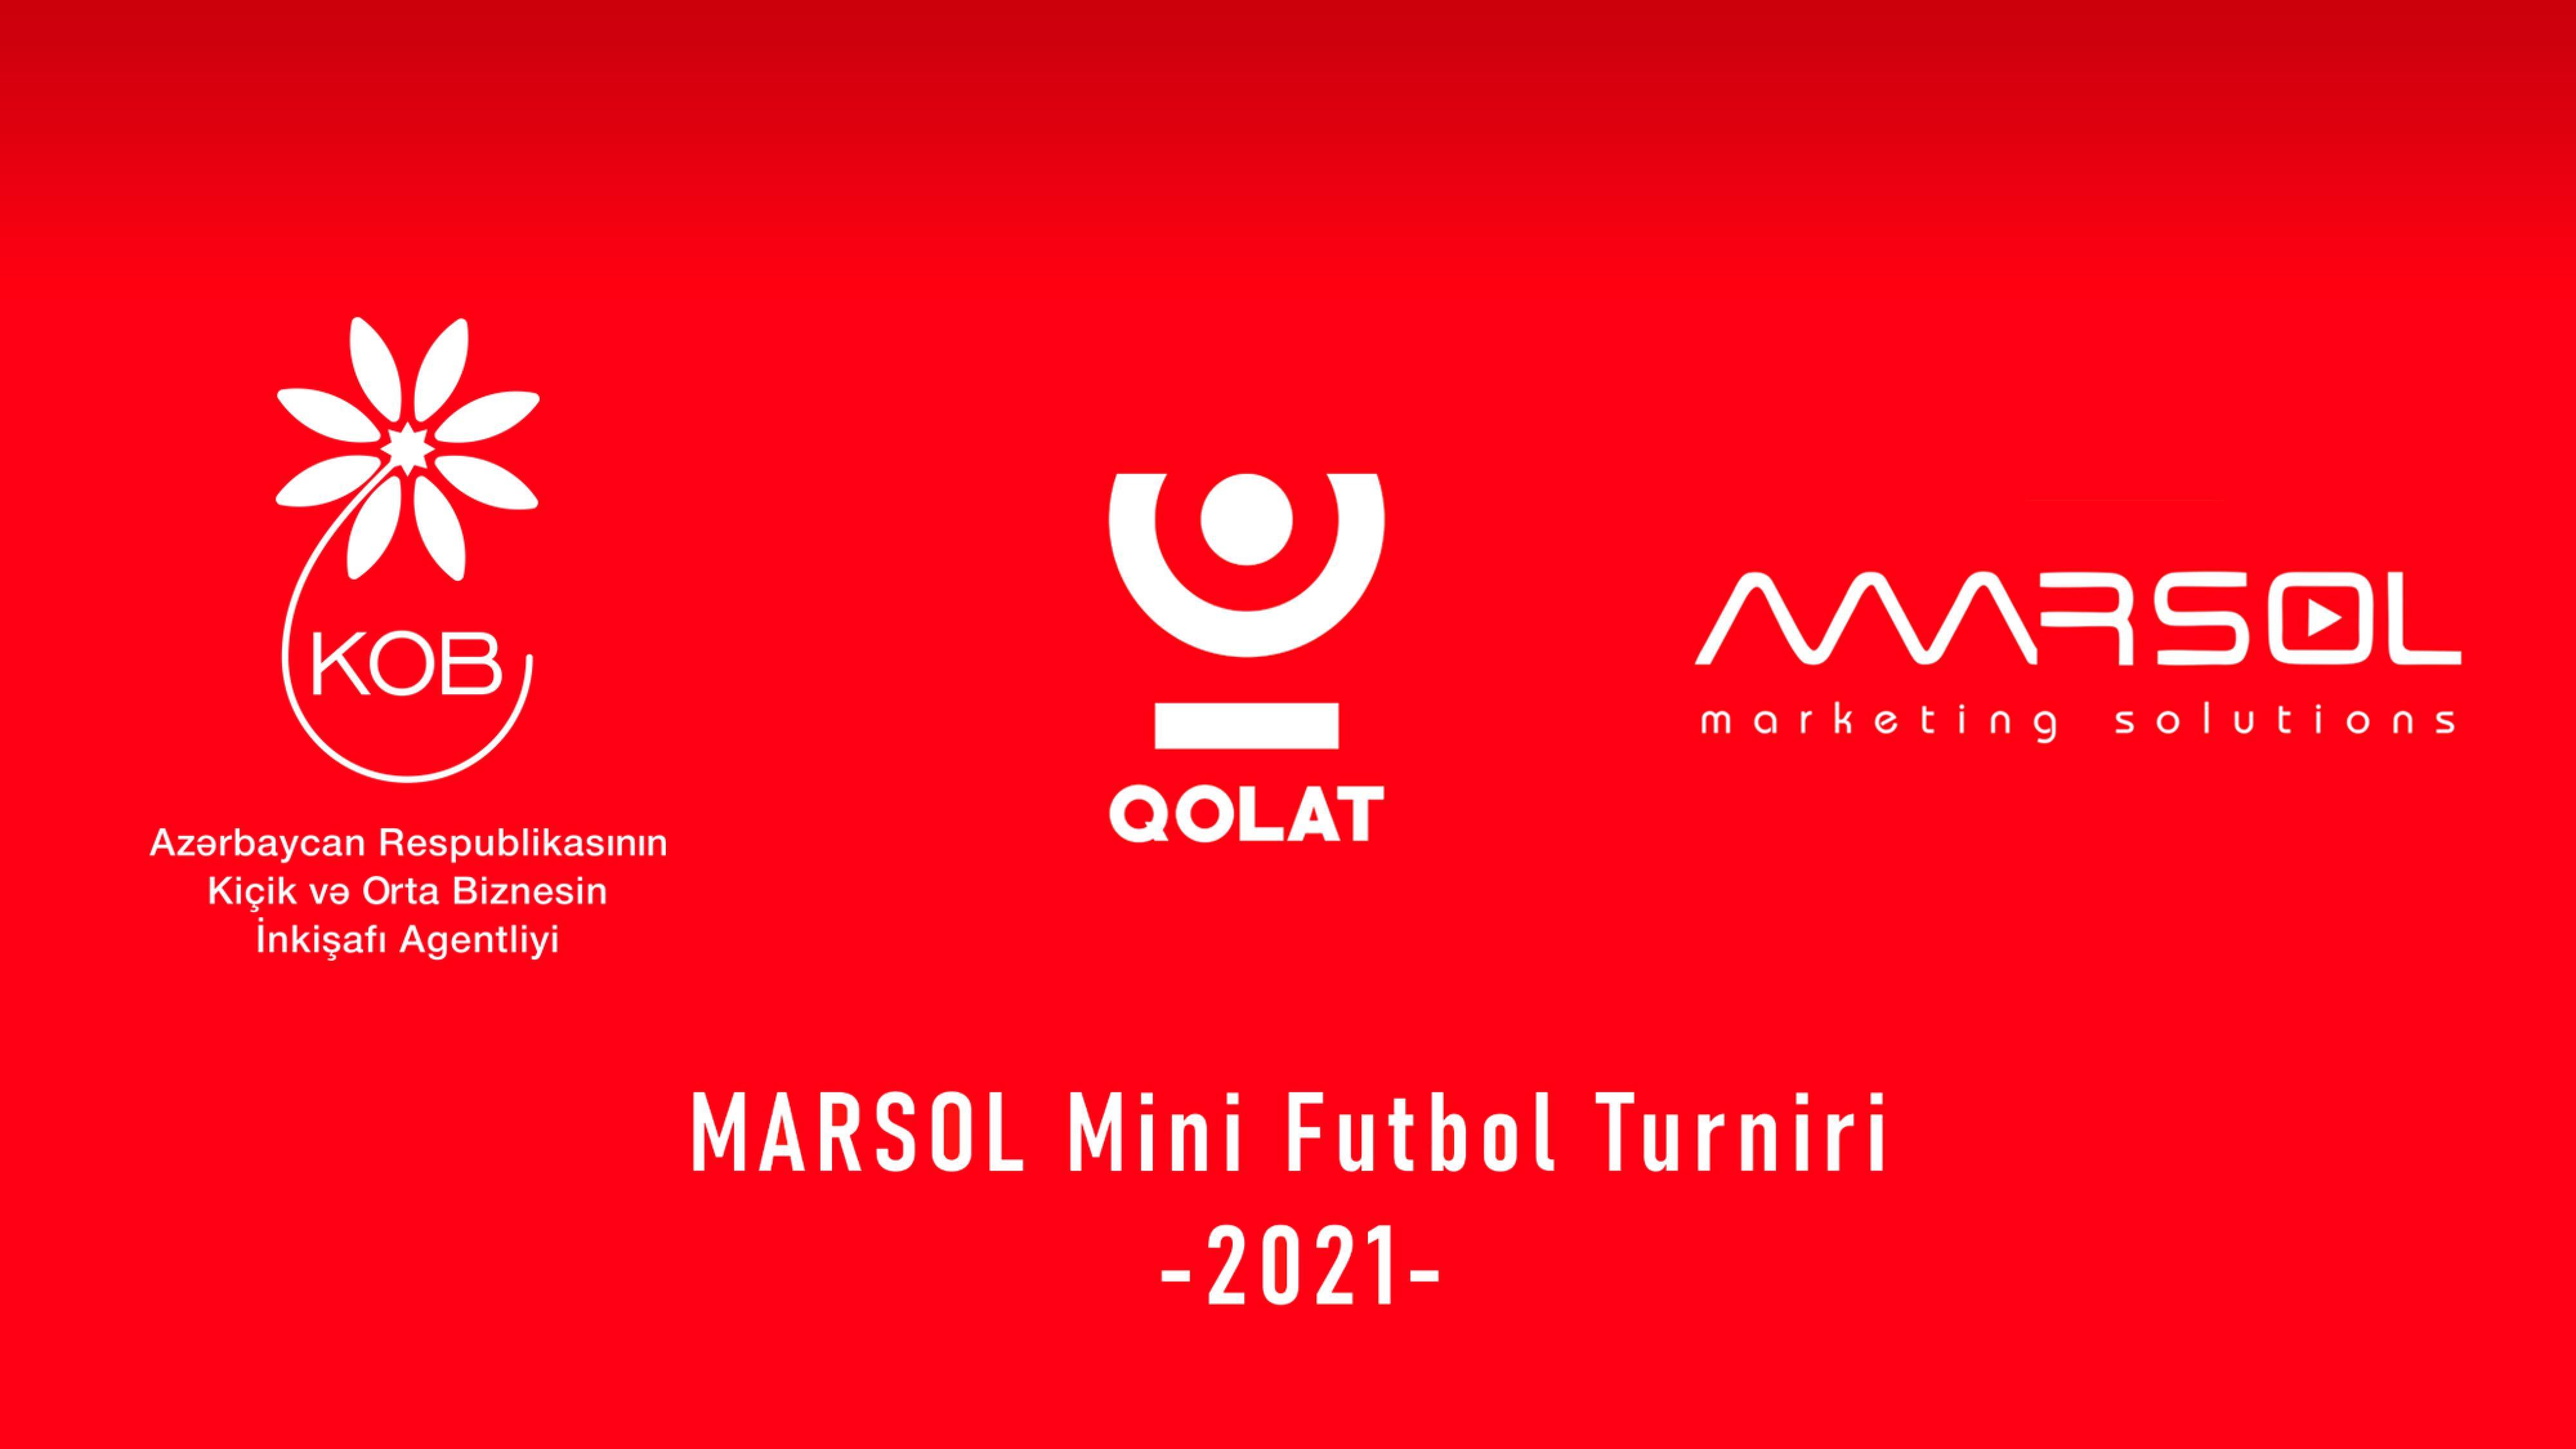 """MARSOL Mini Futbol Turniri 2021"